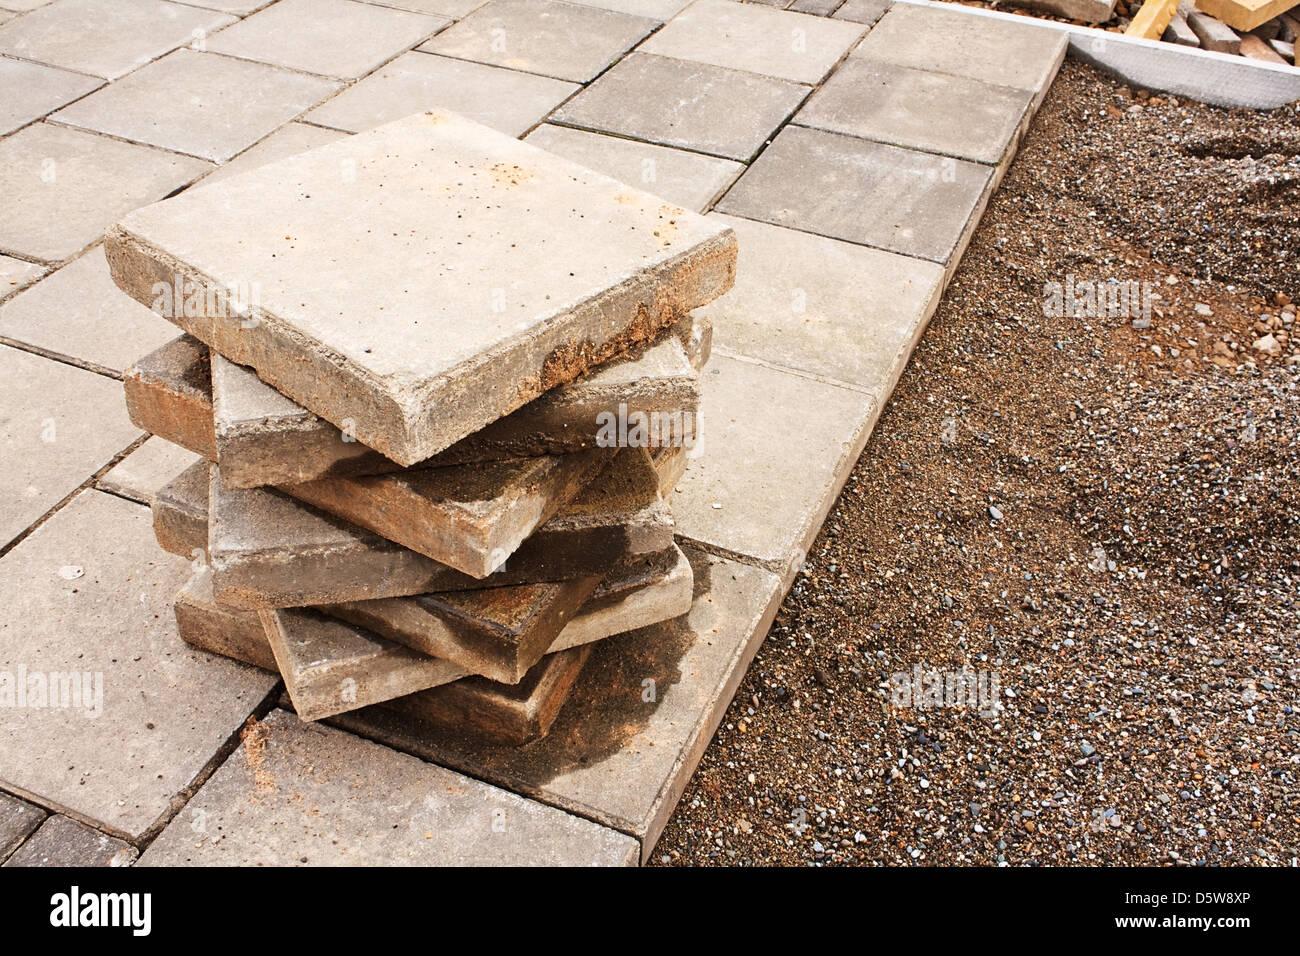 Fußbodenplatten Xp ~ Paving industry stockfotos & paving industry bilder alamy